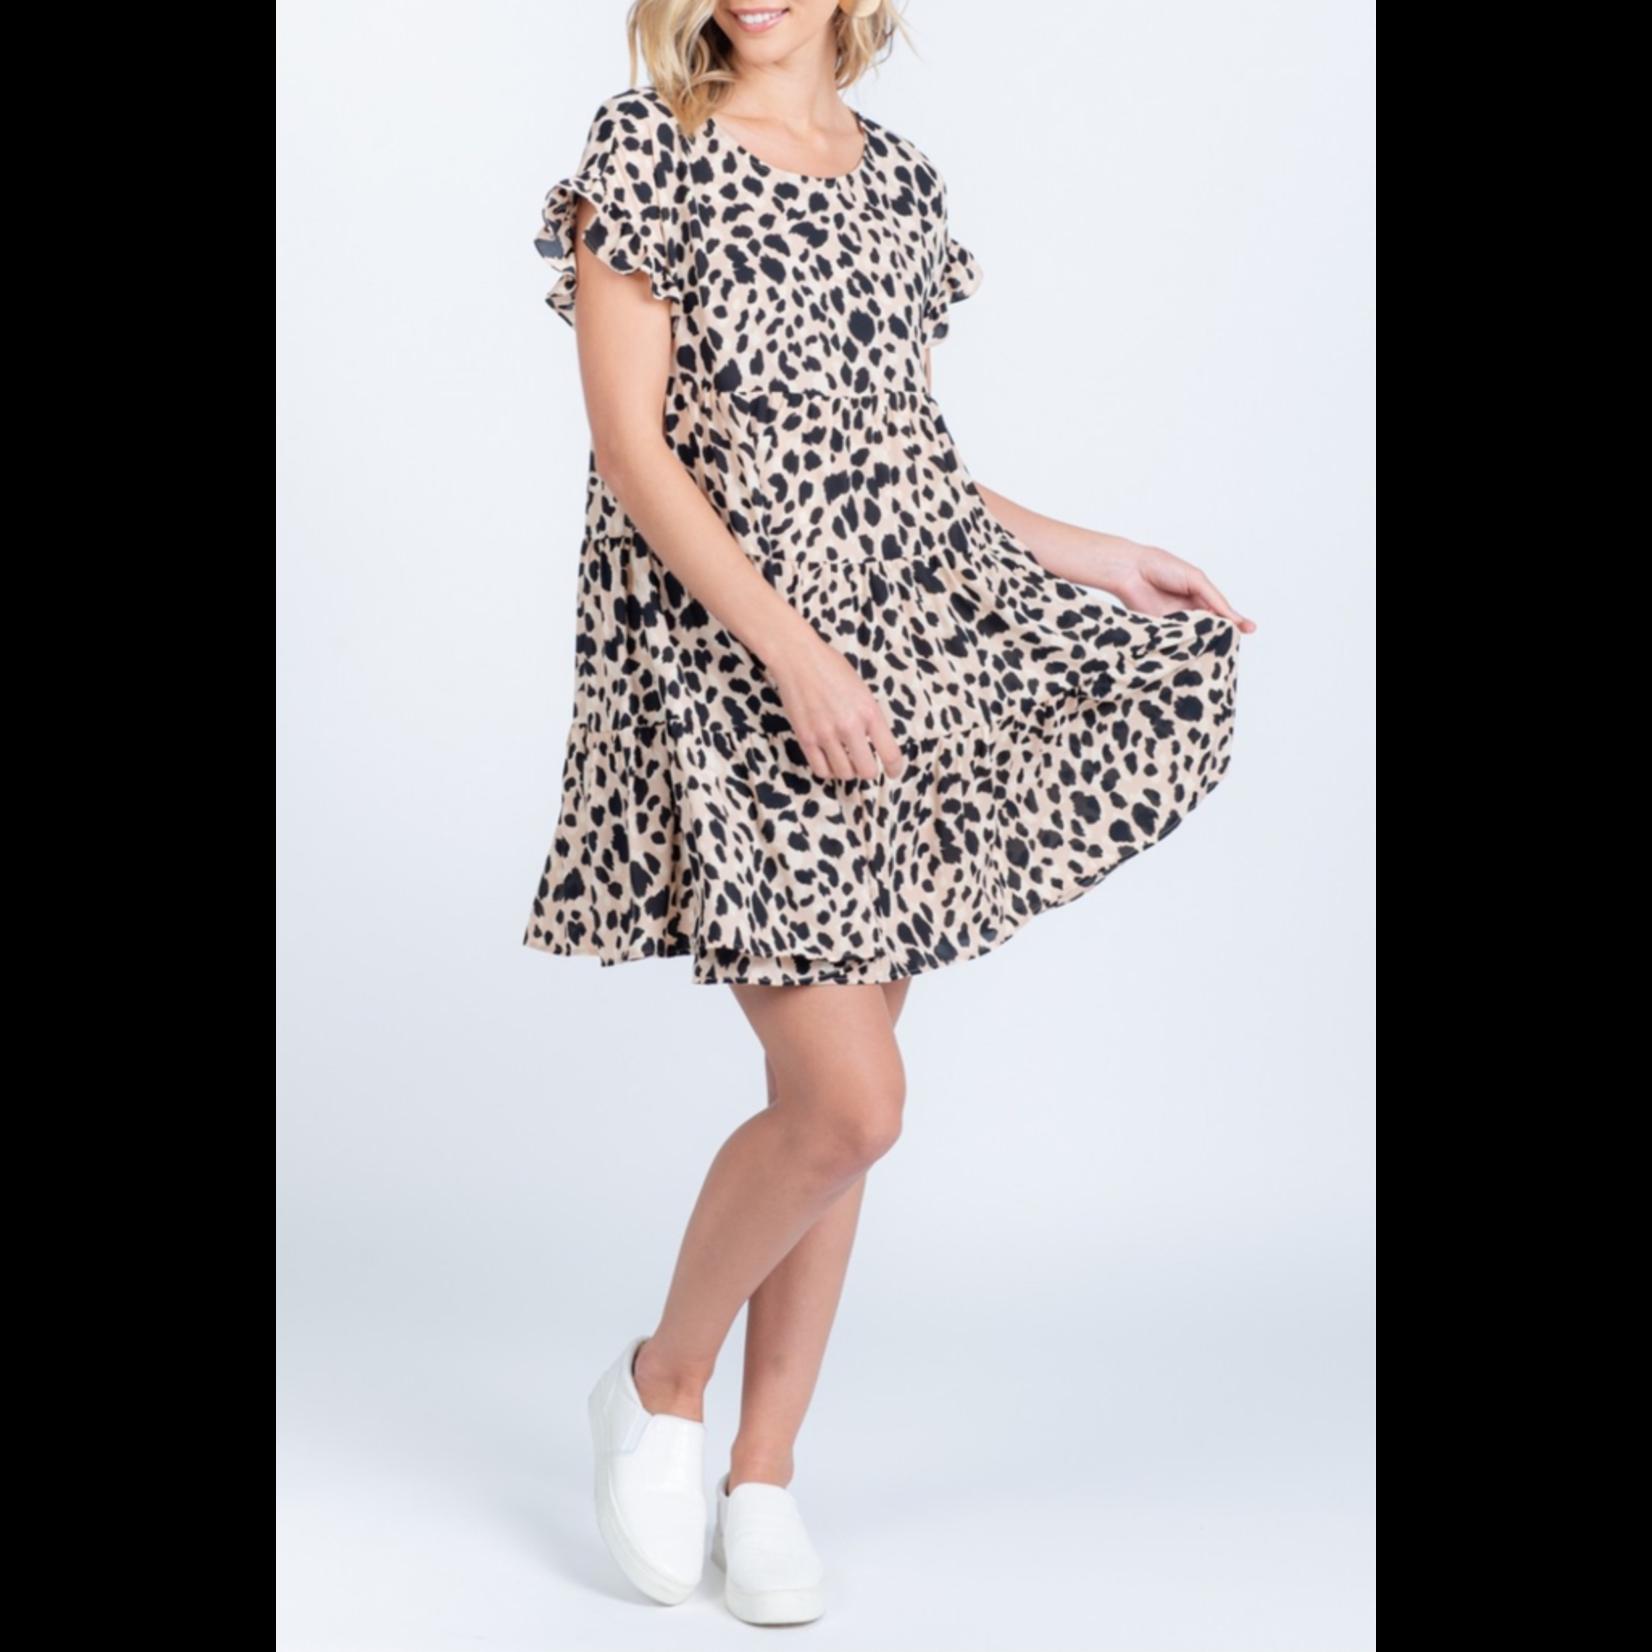 Everly Ruffle animal print dress